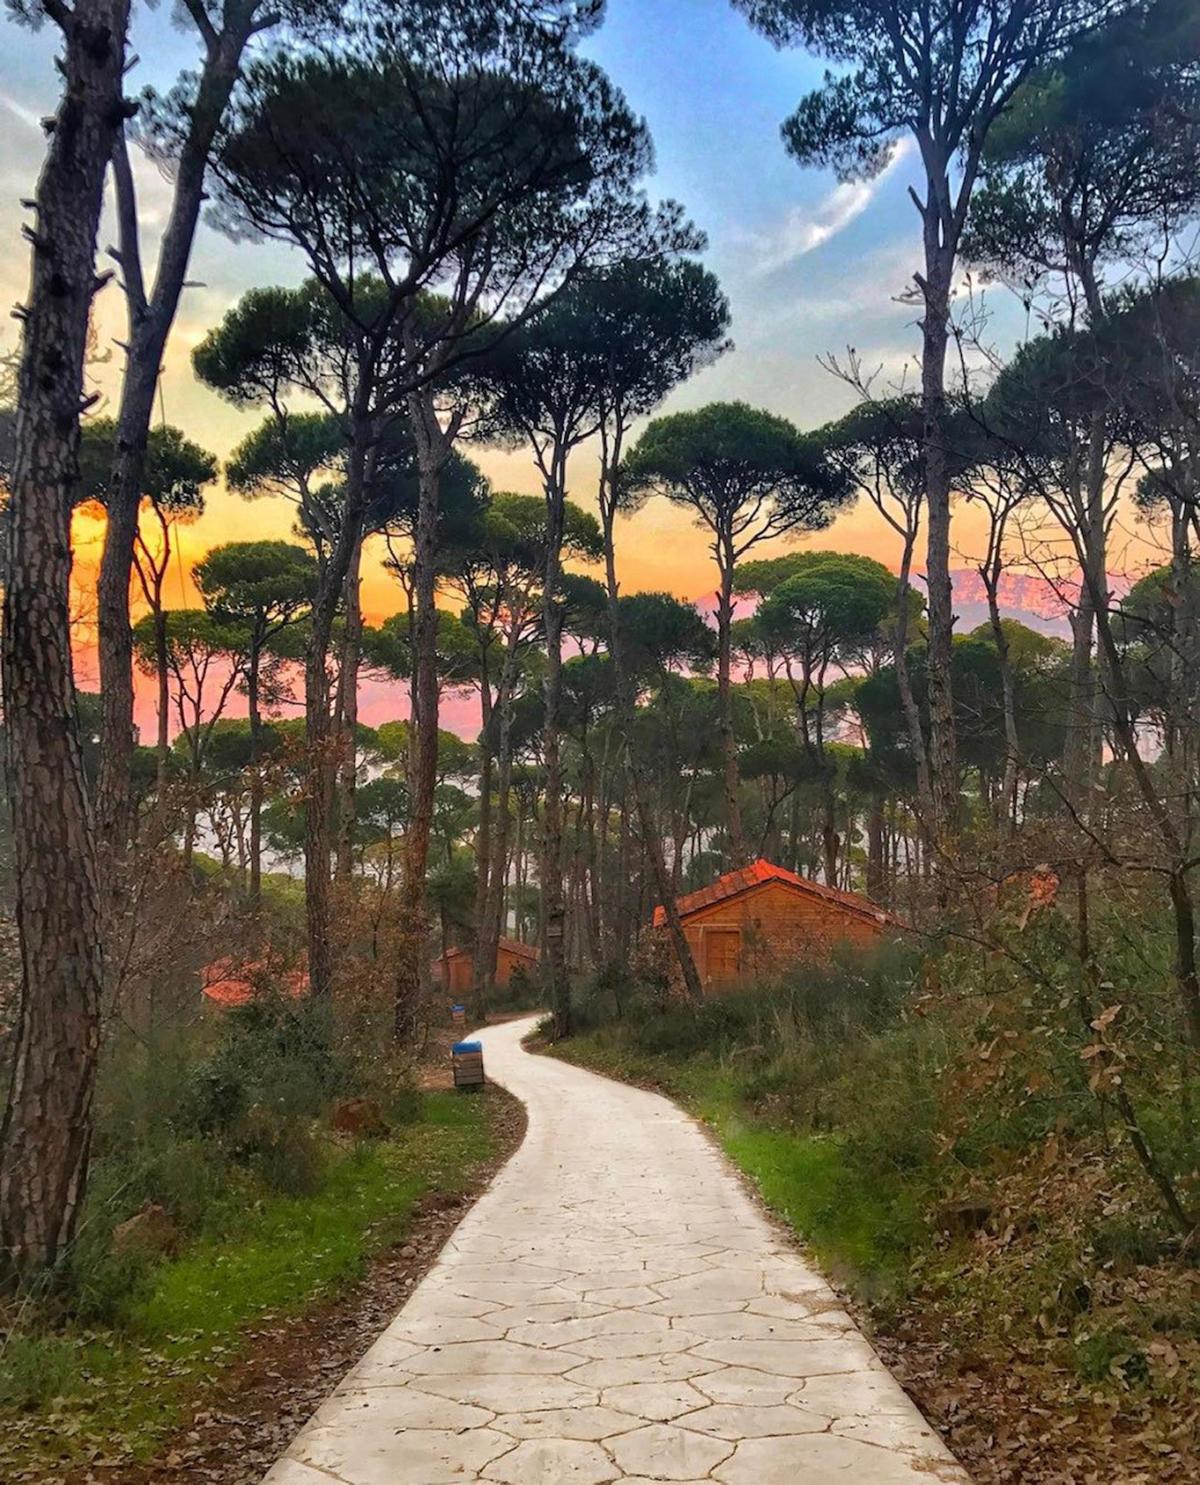 jezzine-sunset-shots-lebanon-traveler